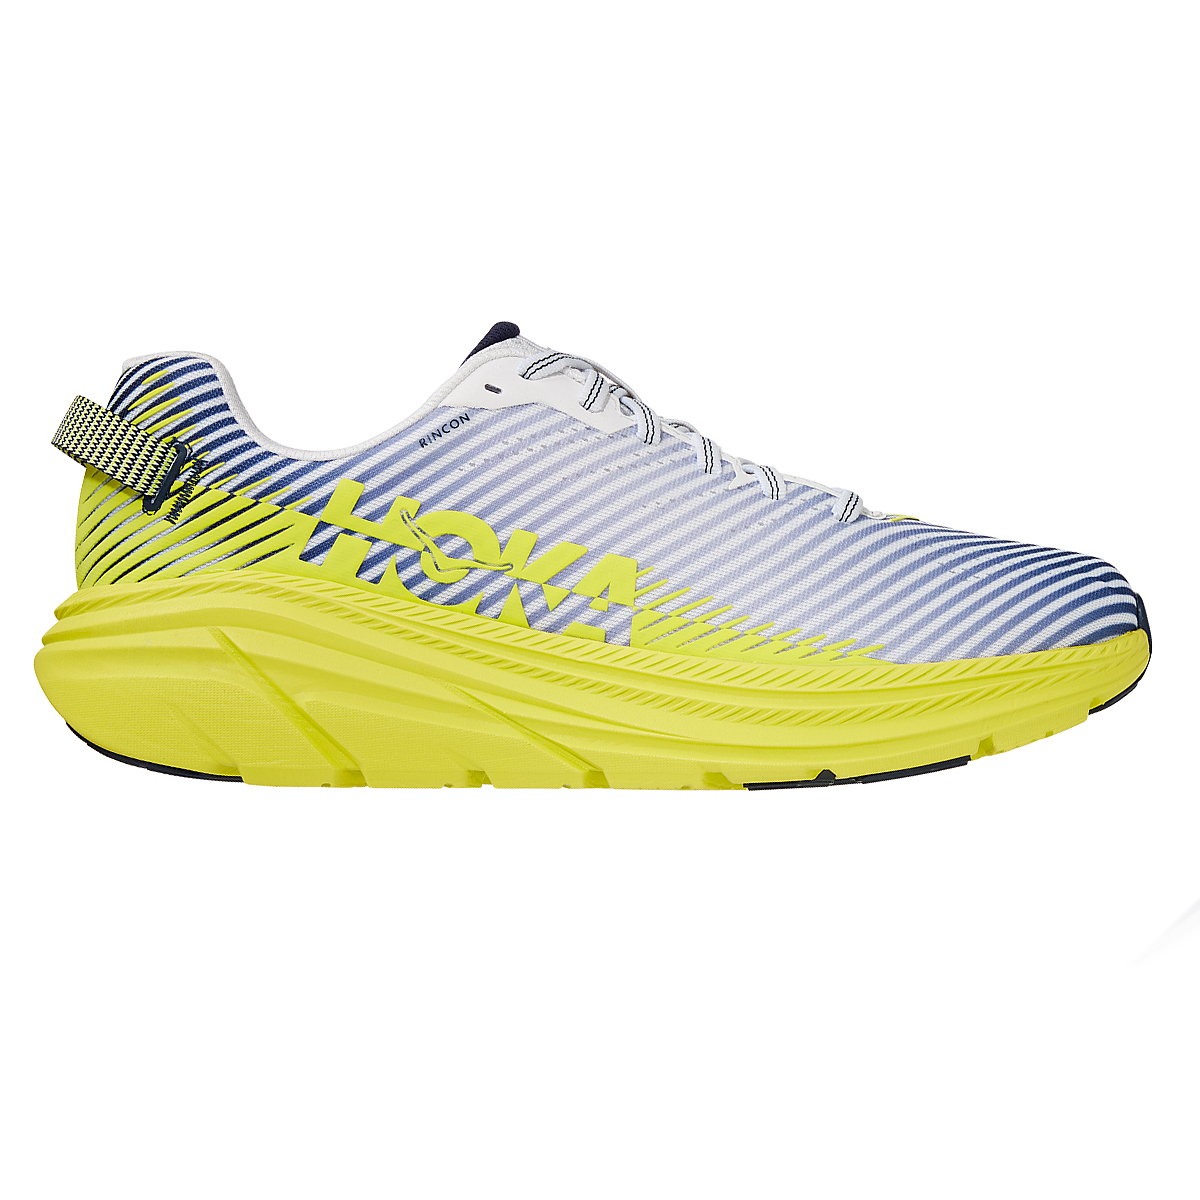 Men's Hoka One One Rincon 2 Running Shoe - Color: White/Yellow - Size: 7 - Width: Regular, White/Yellow, large, image 1